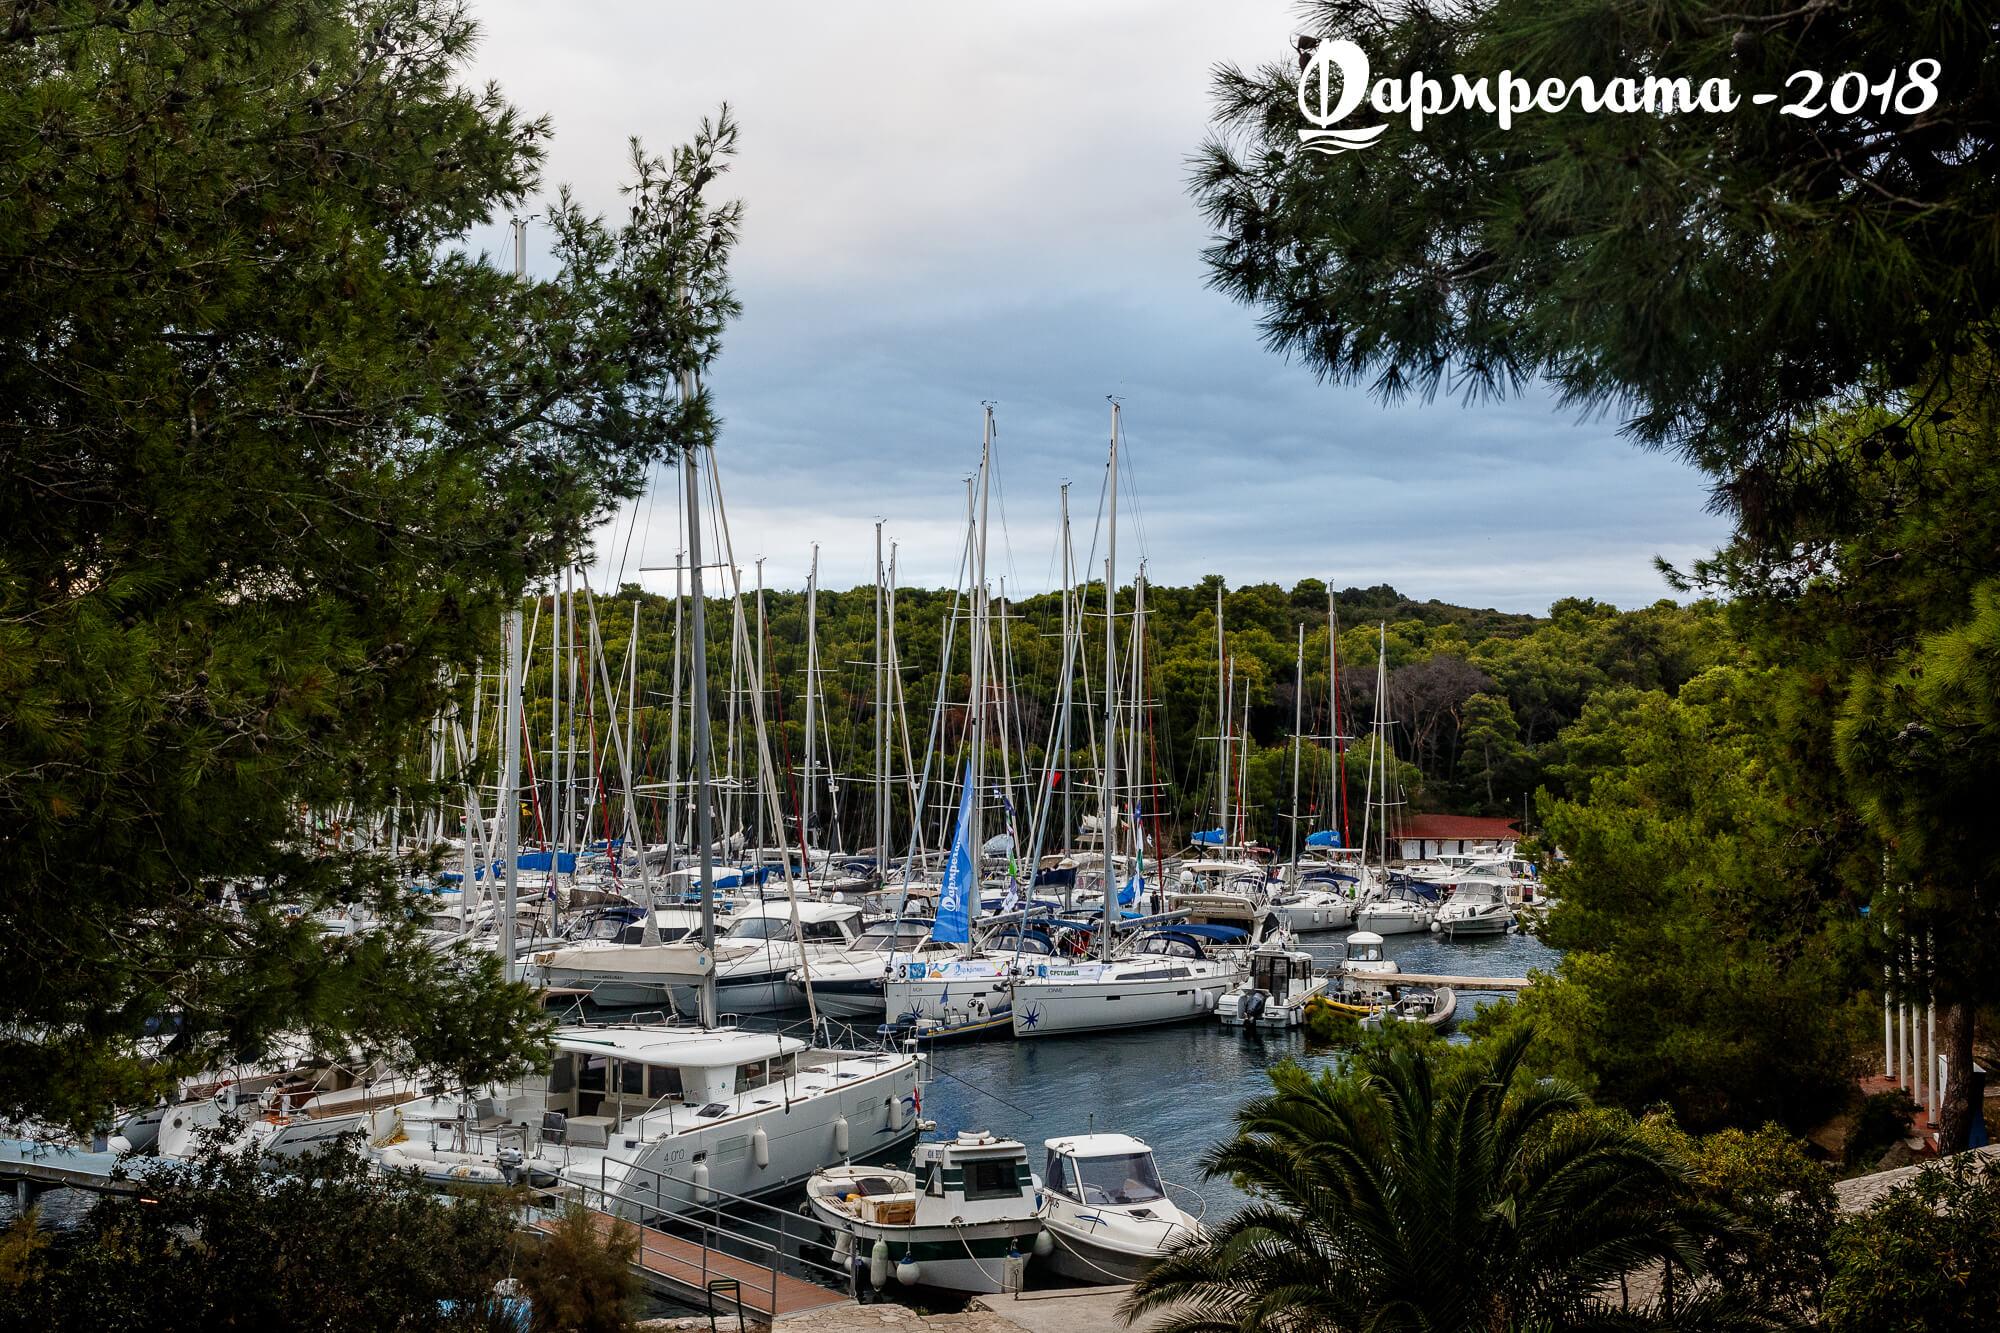 Путешествие, яхтинг, порт - ДСМ групп Фармрегата 2018 - DSM Group Pharmregata 2018